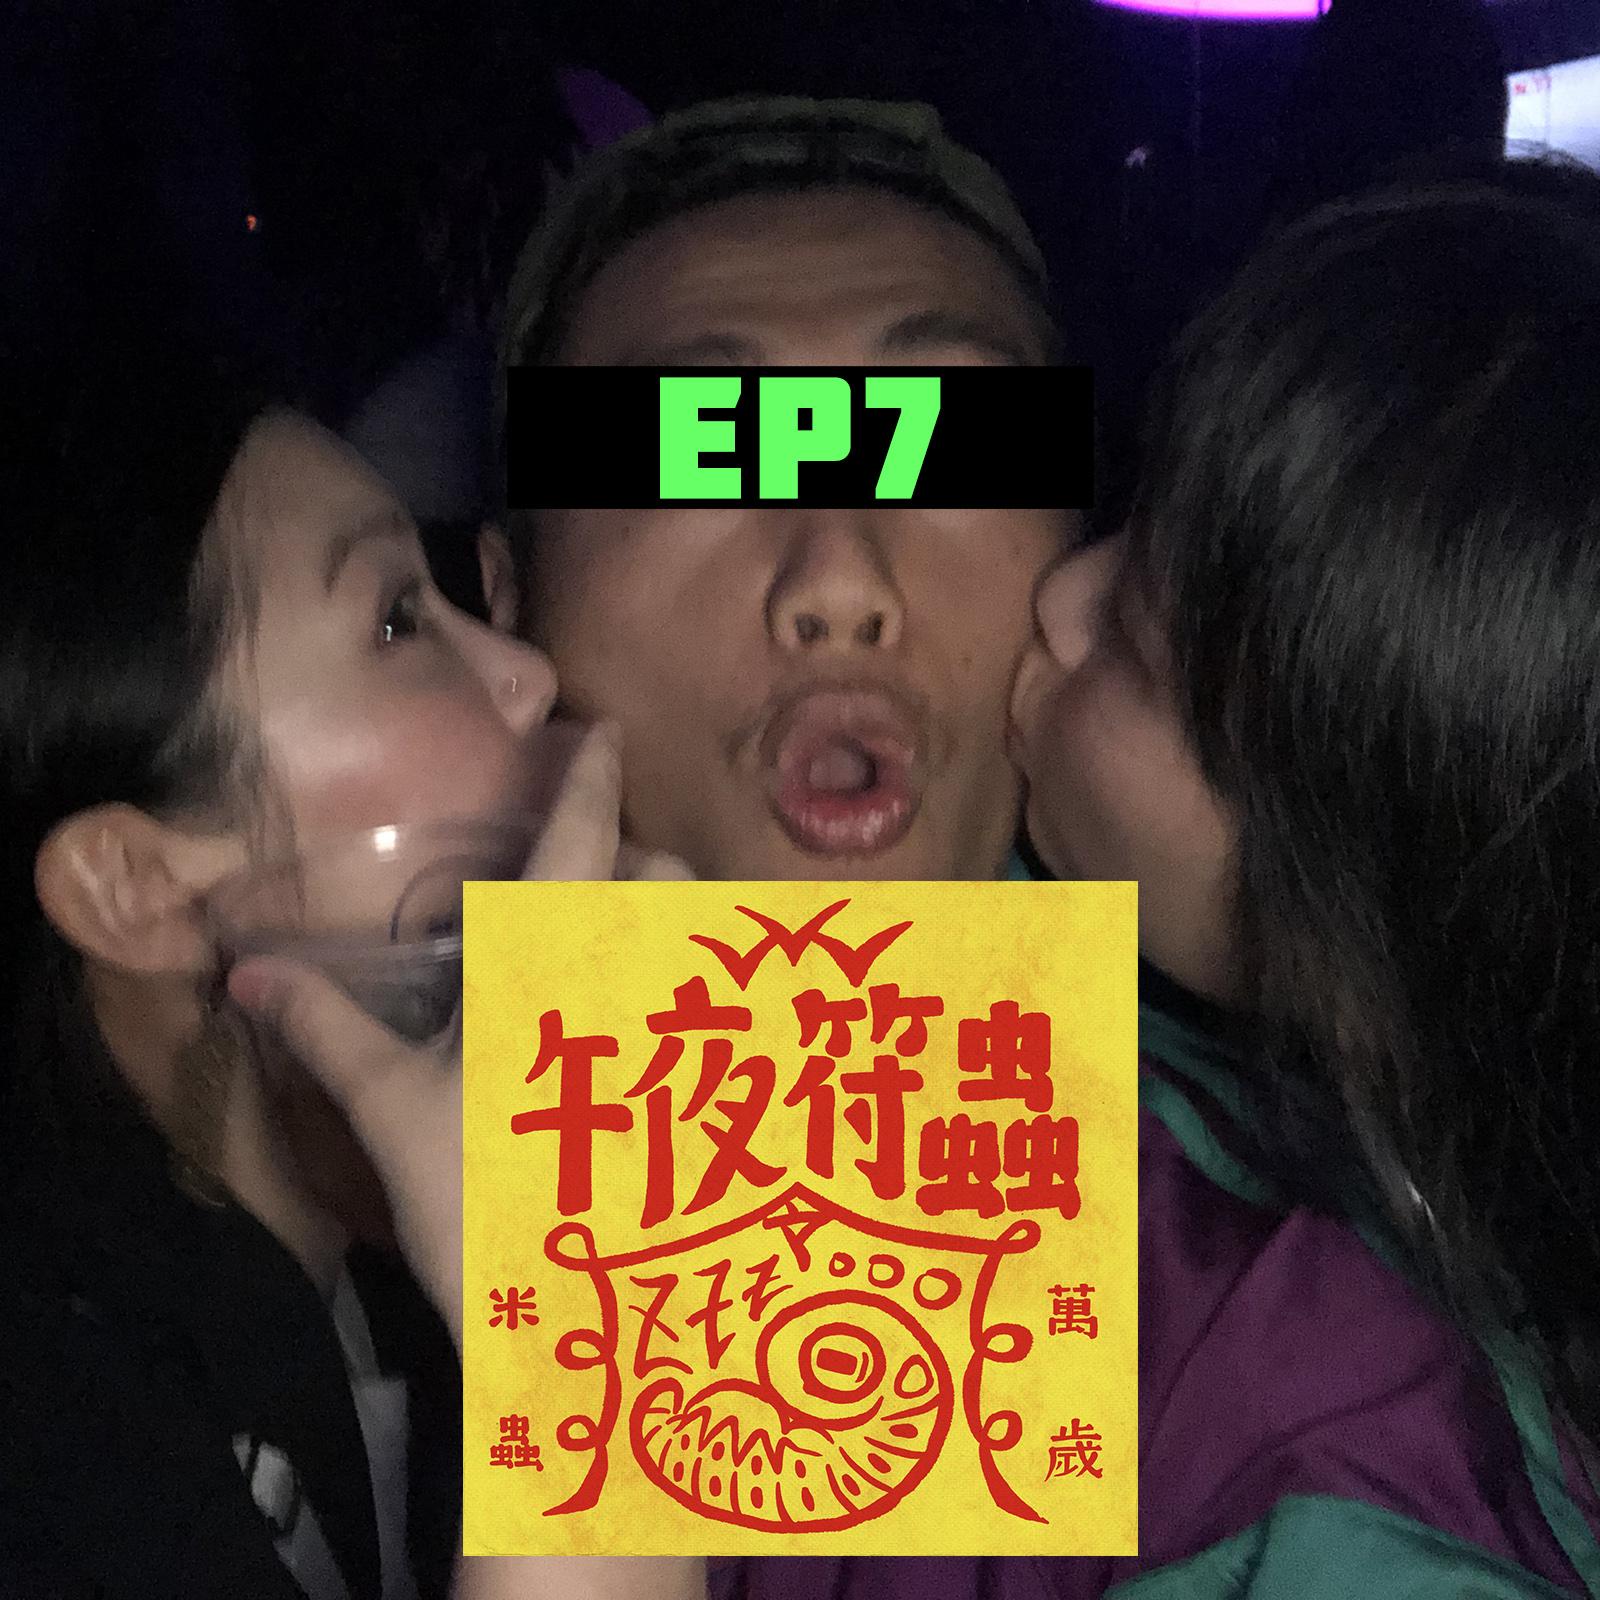 EP7 午夜符蟲 (酒到底要怎麼喝)